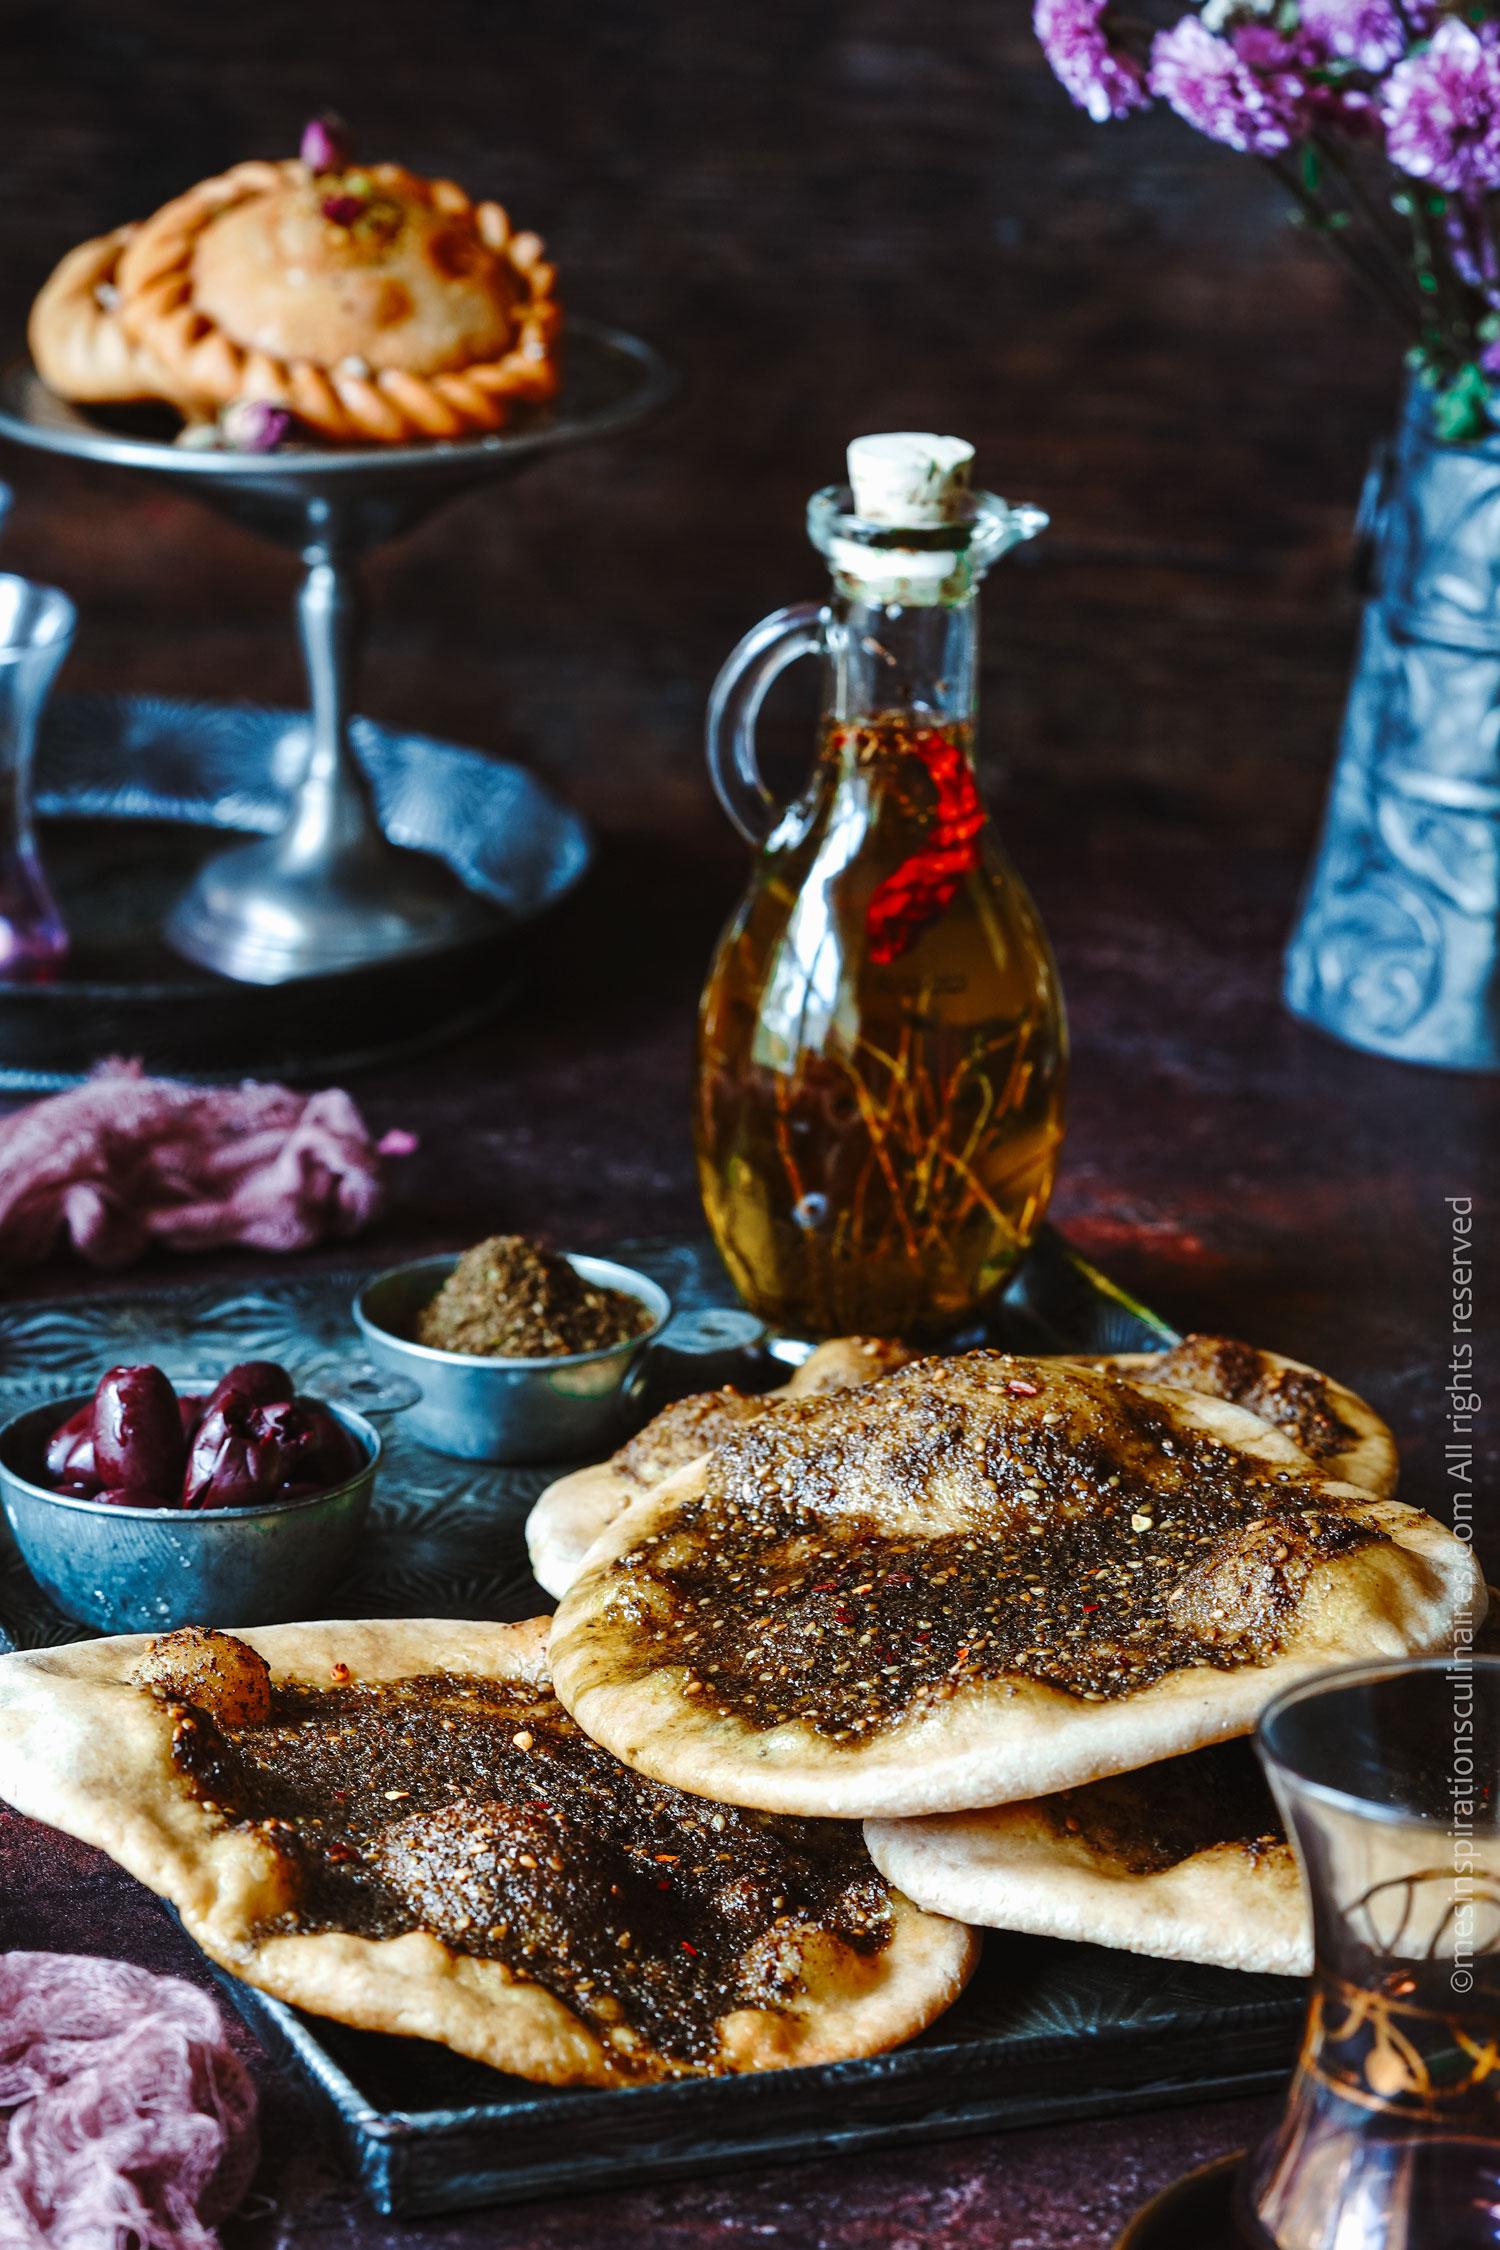 Pain libanais aux épices Za'atar (Man'oushe)